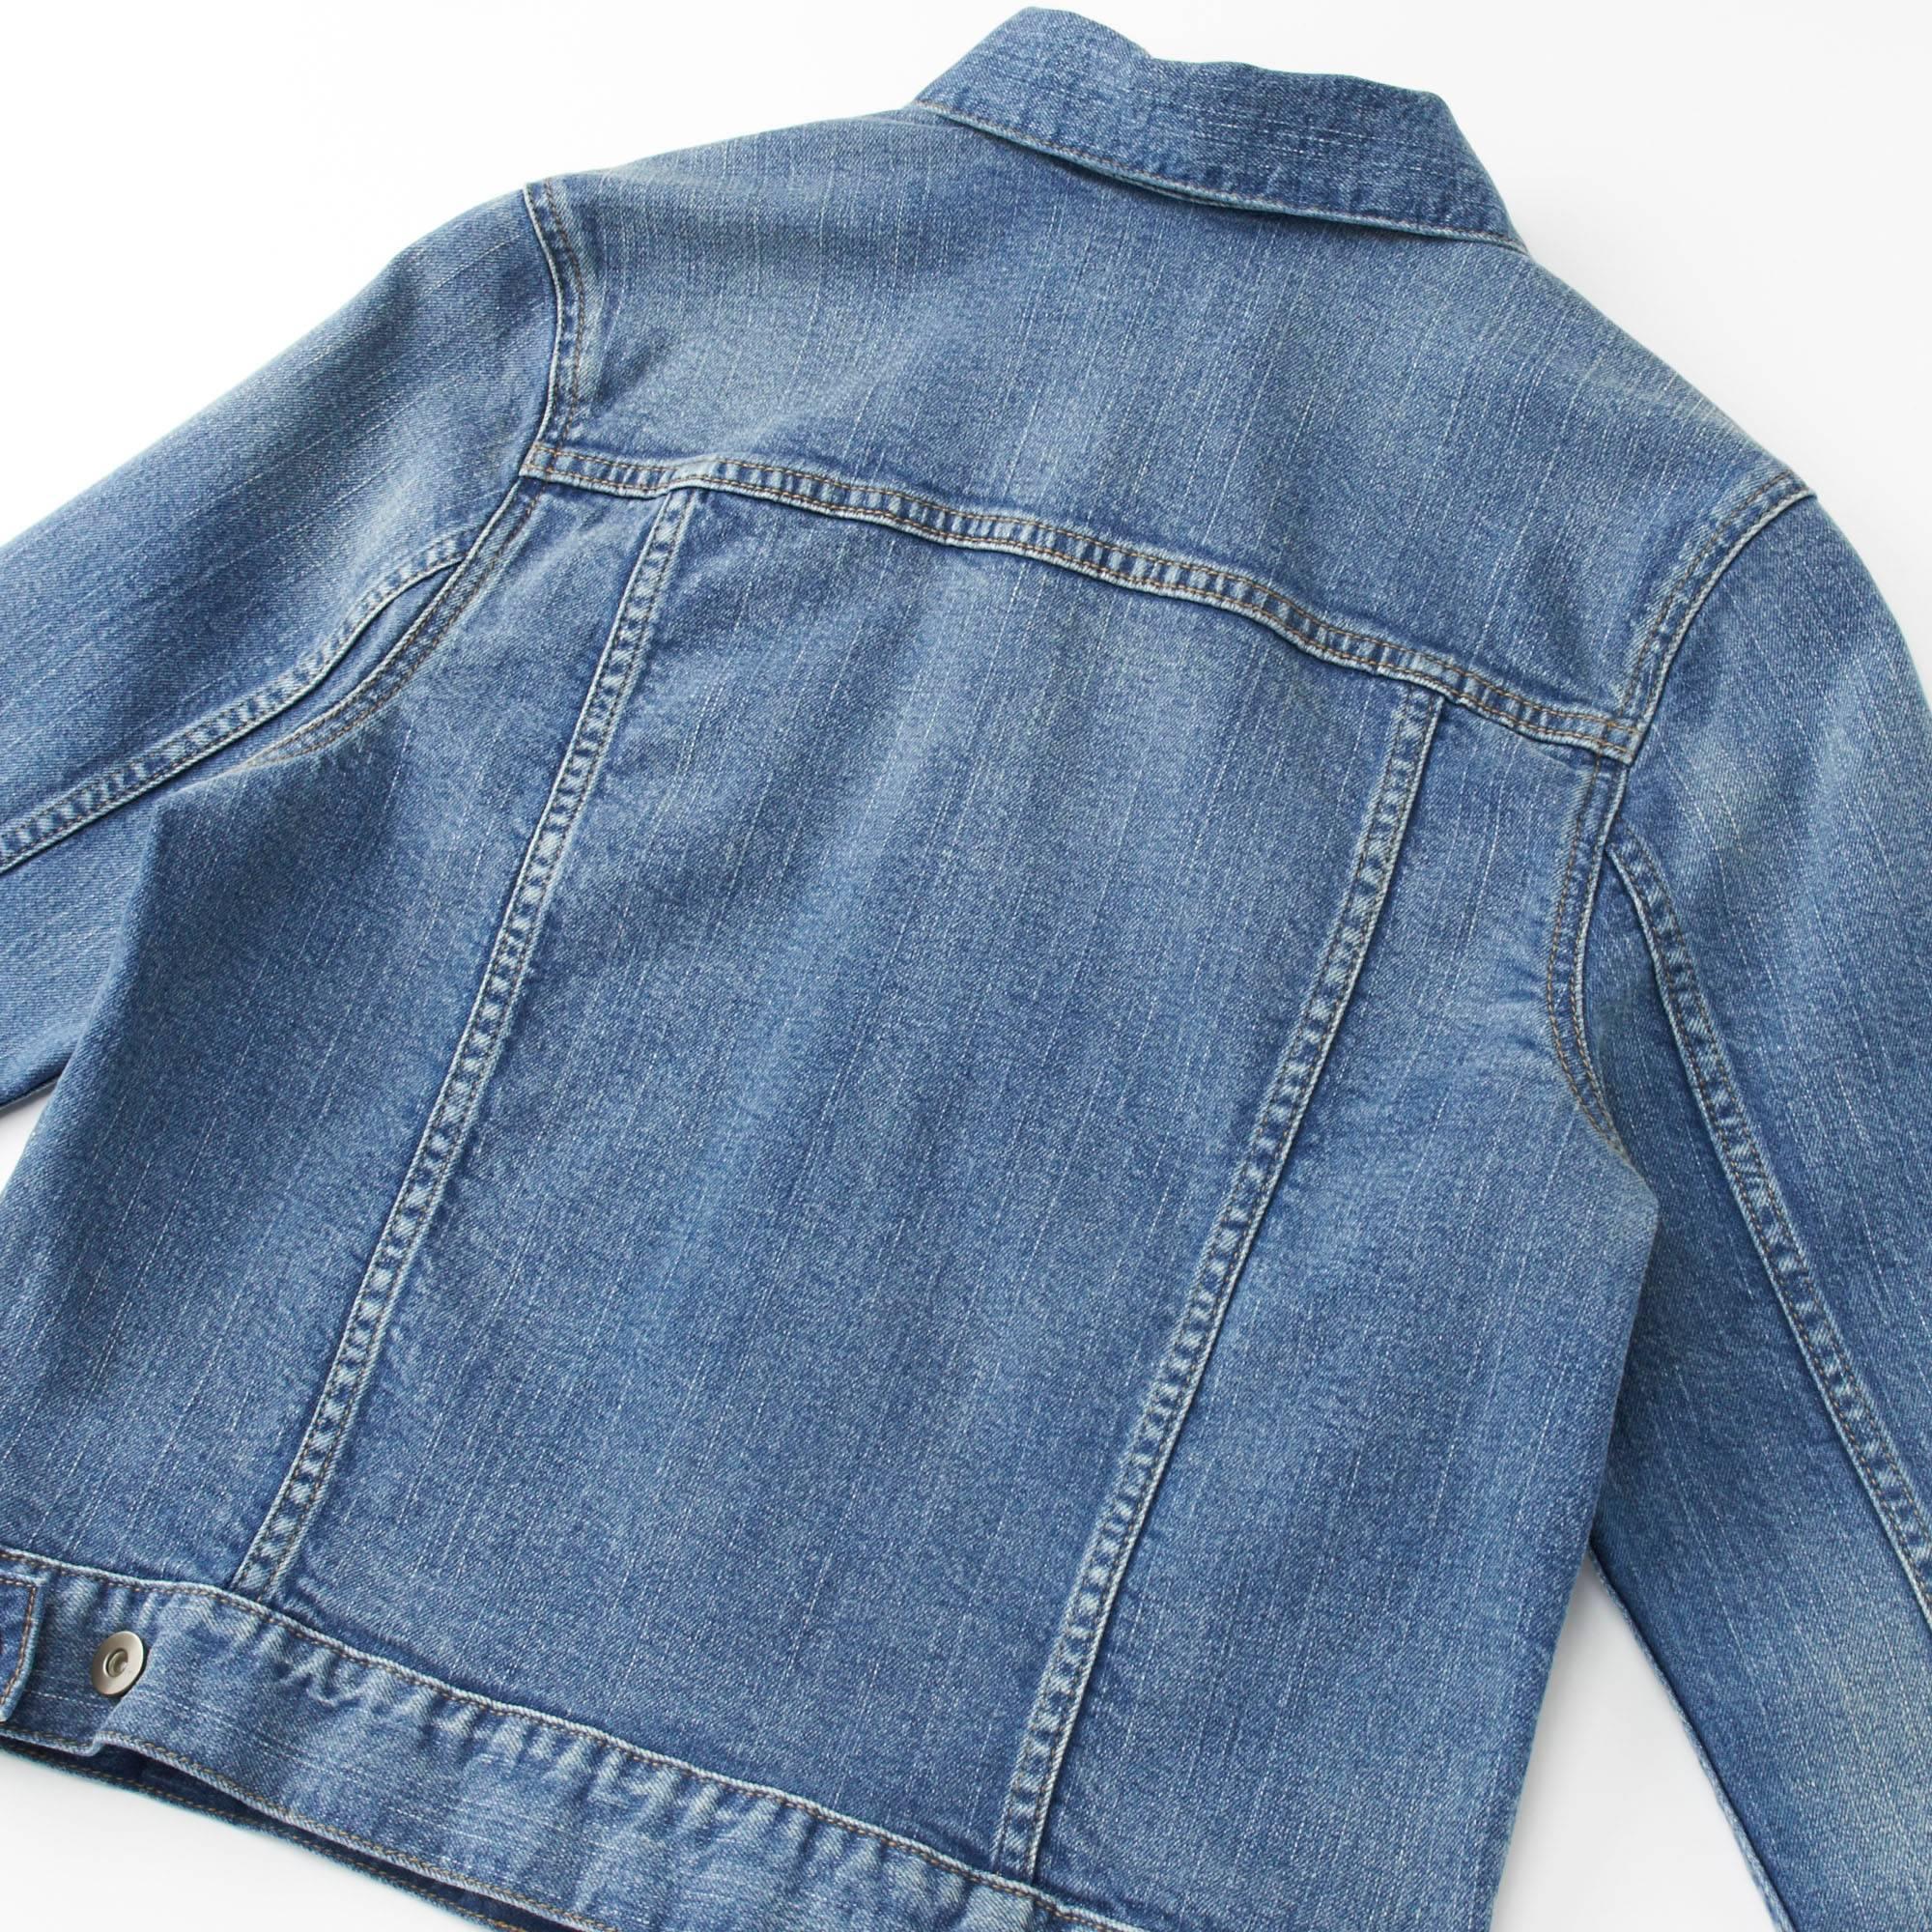 womens denim jacket women denim jacket, blue, small BFLLIHZ